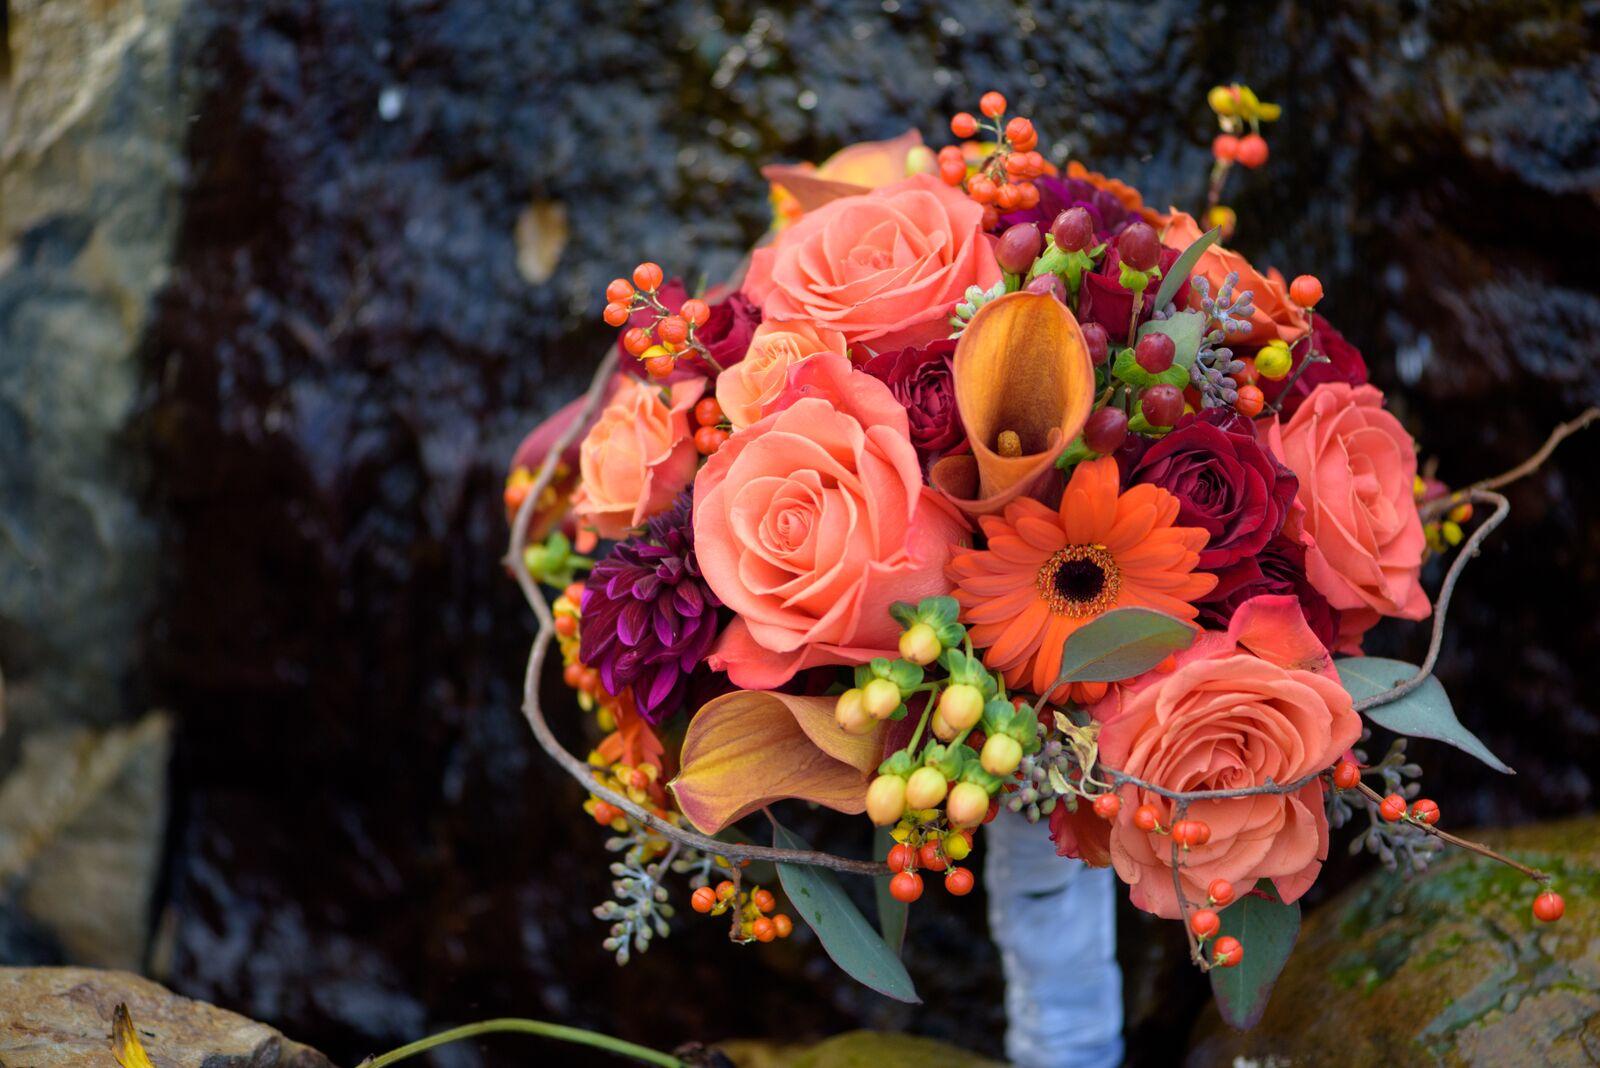 silk-wedding-flowers-bouquet-recreation